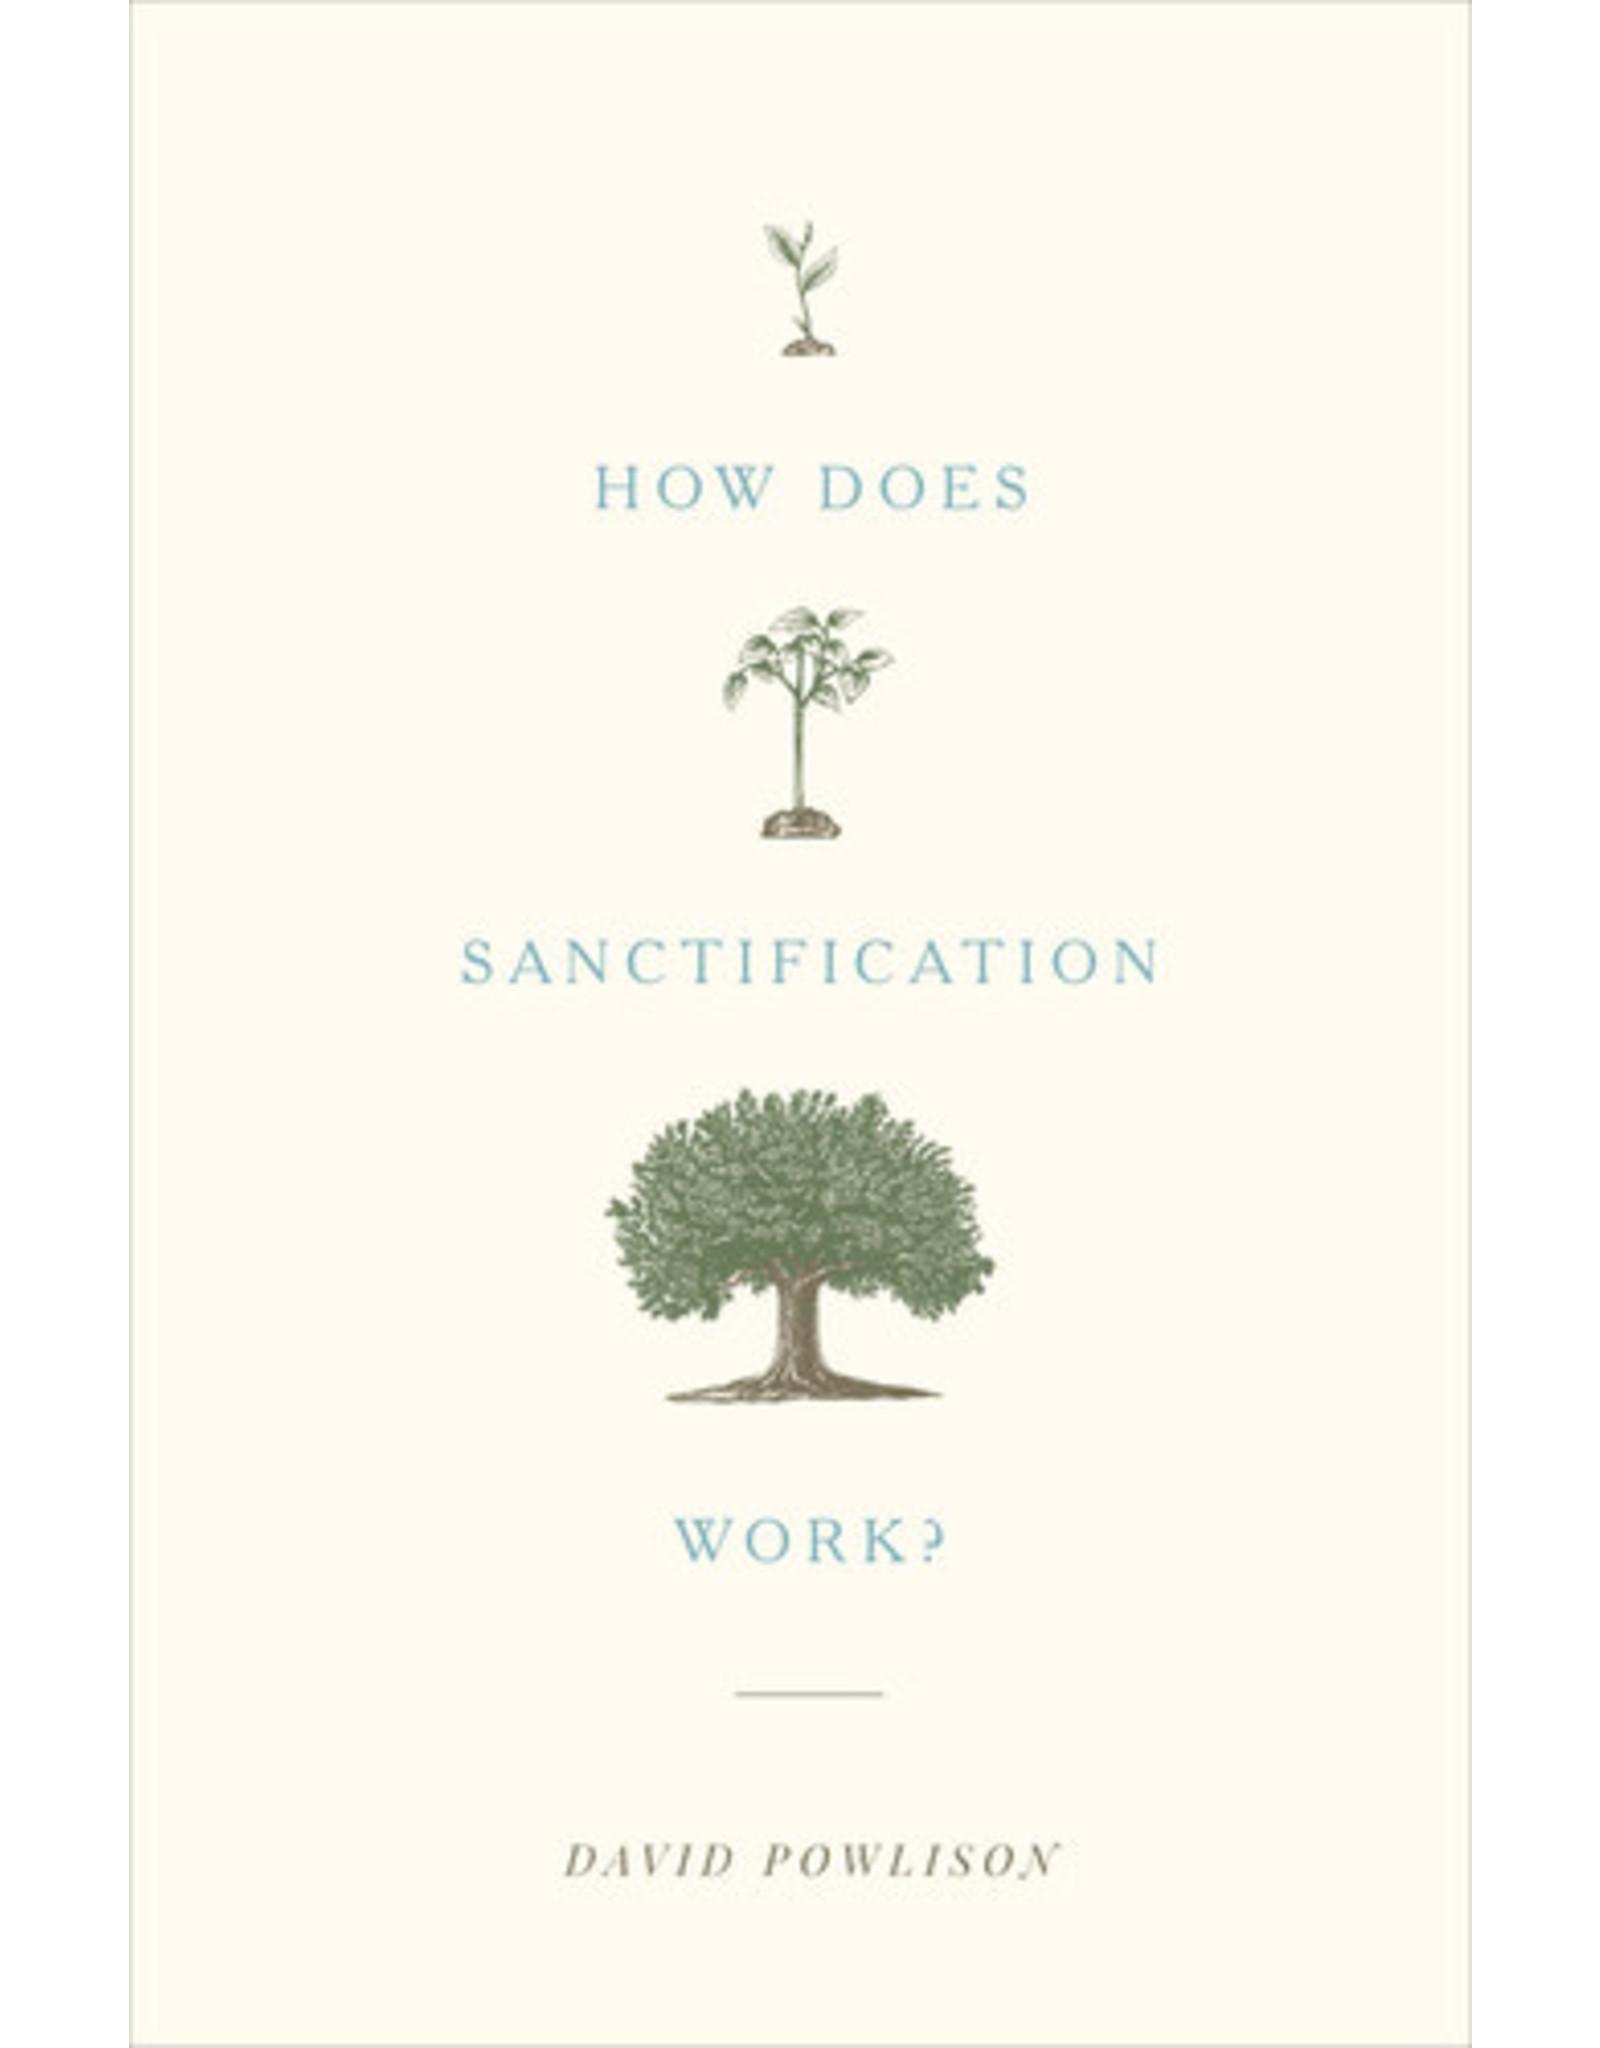 Powlison How Does Santification Work?